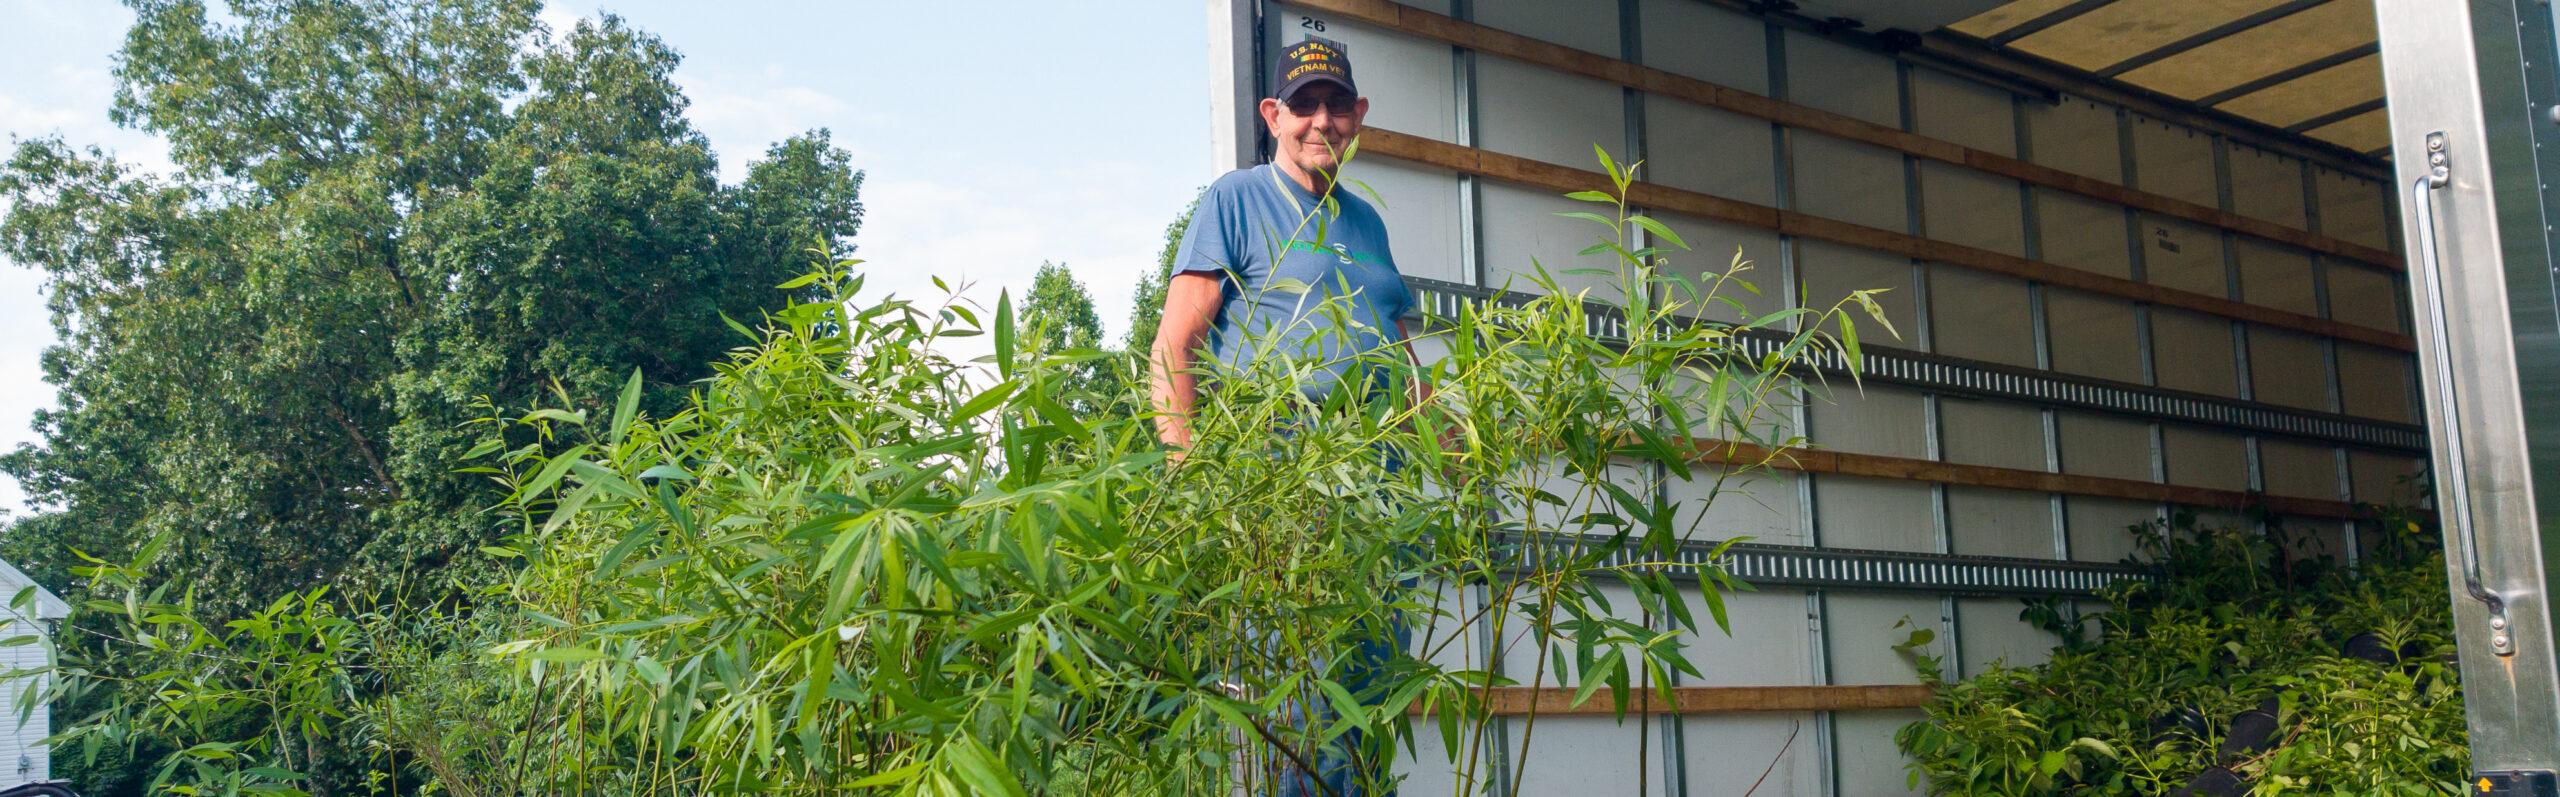 Buy Native Plants